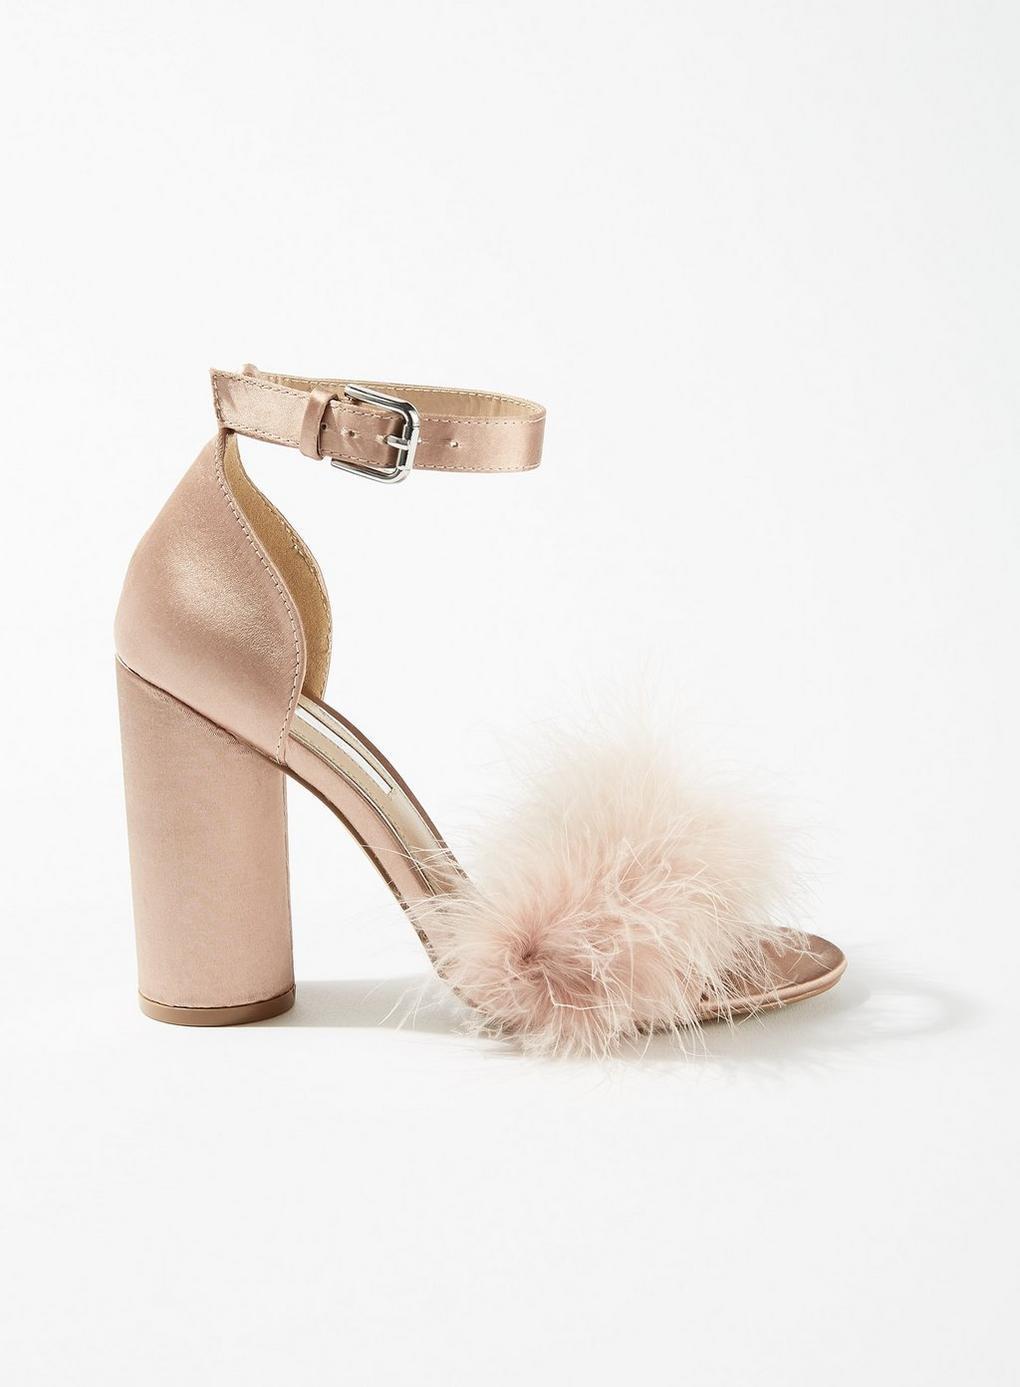 46237f41c2c24 Miss Selfridge Hennie Feather Block Heel Sandals in Natural - Lyst